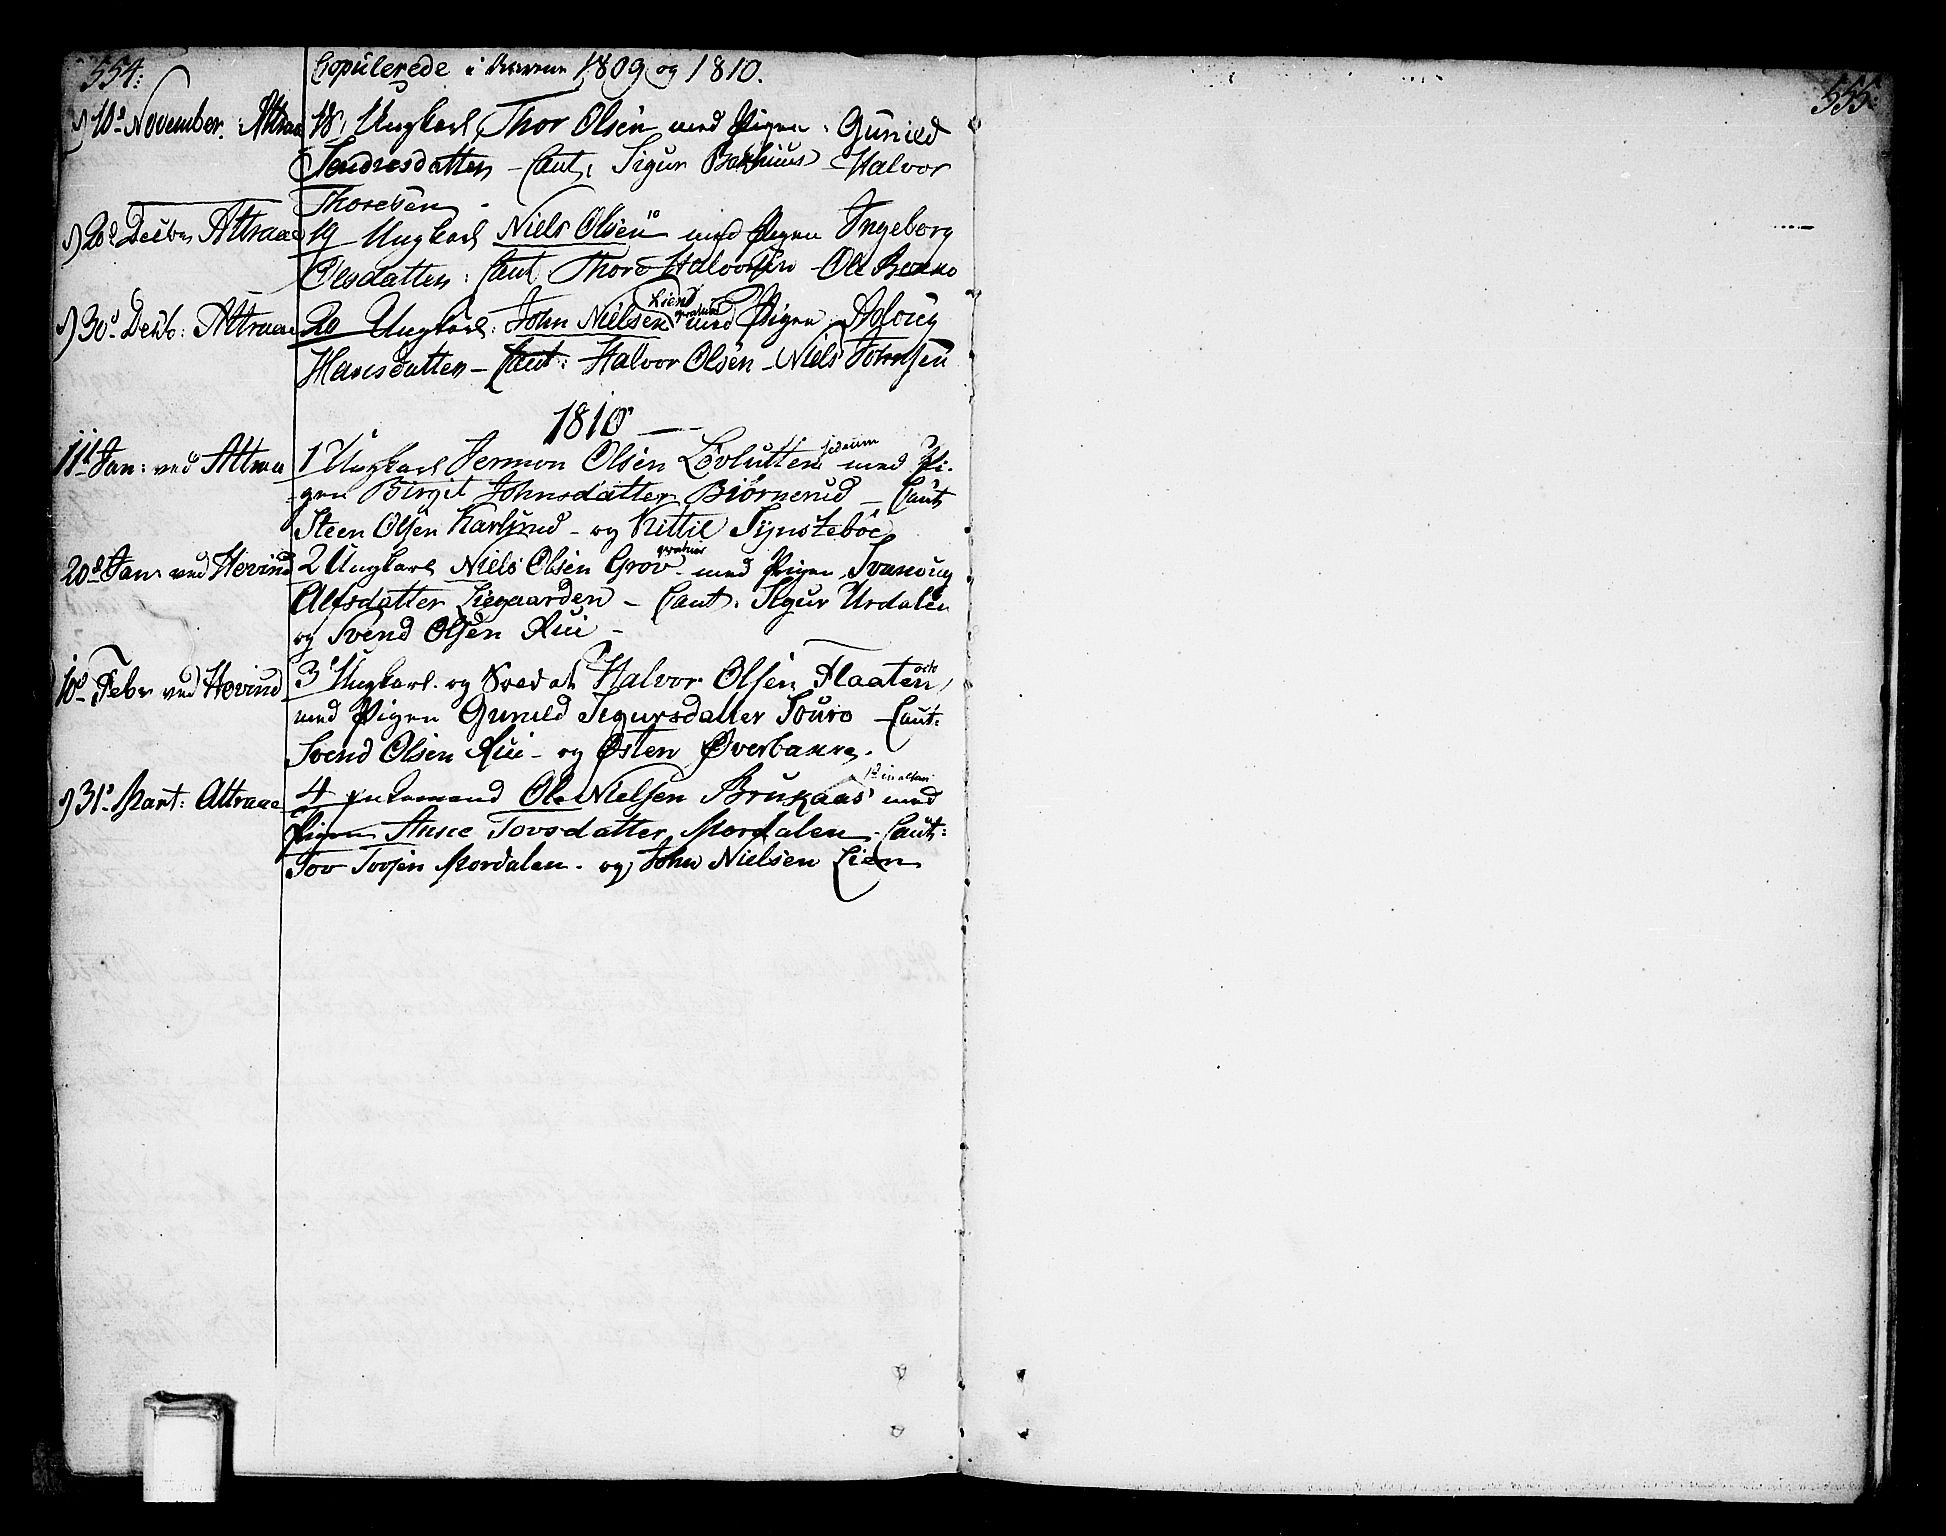 SAKO, Tinn kirkebøker, F/Fa/L0002: Ministerialbok nr. I 2, 1757-1810, s. 554-555